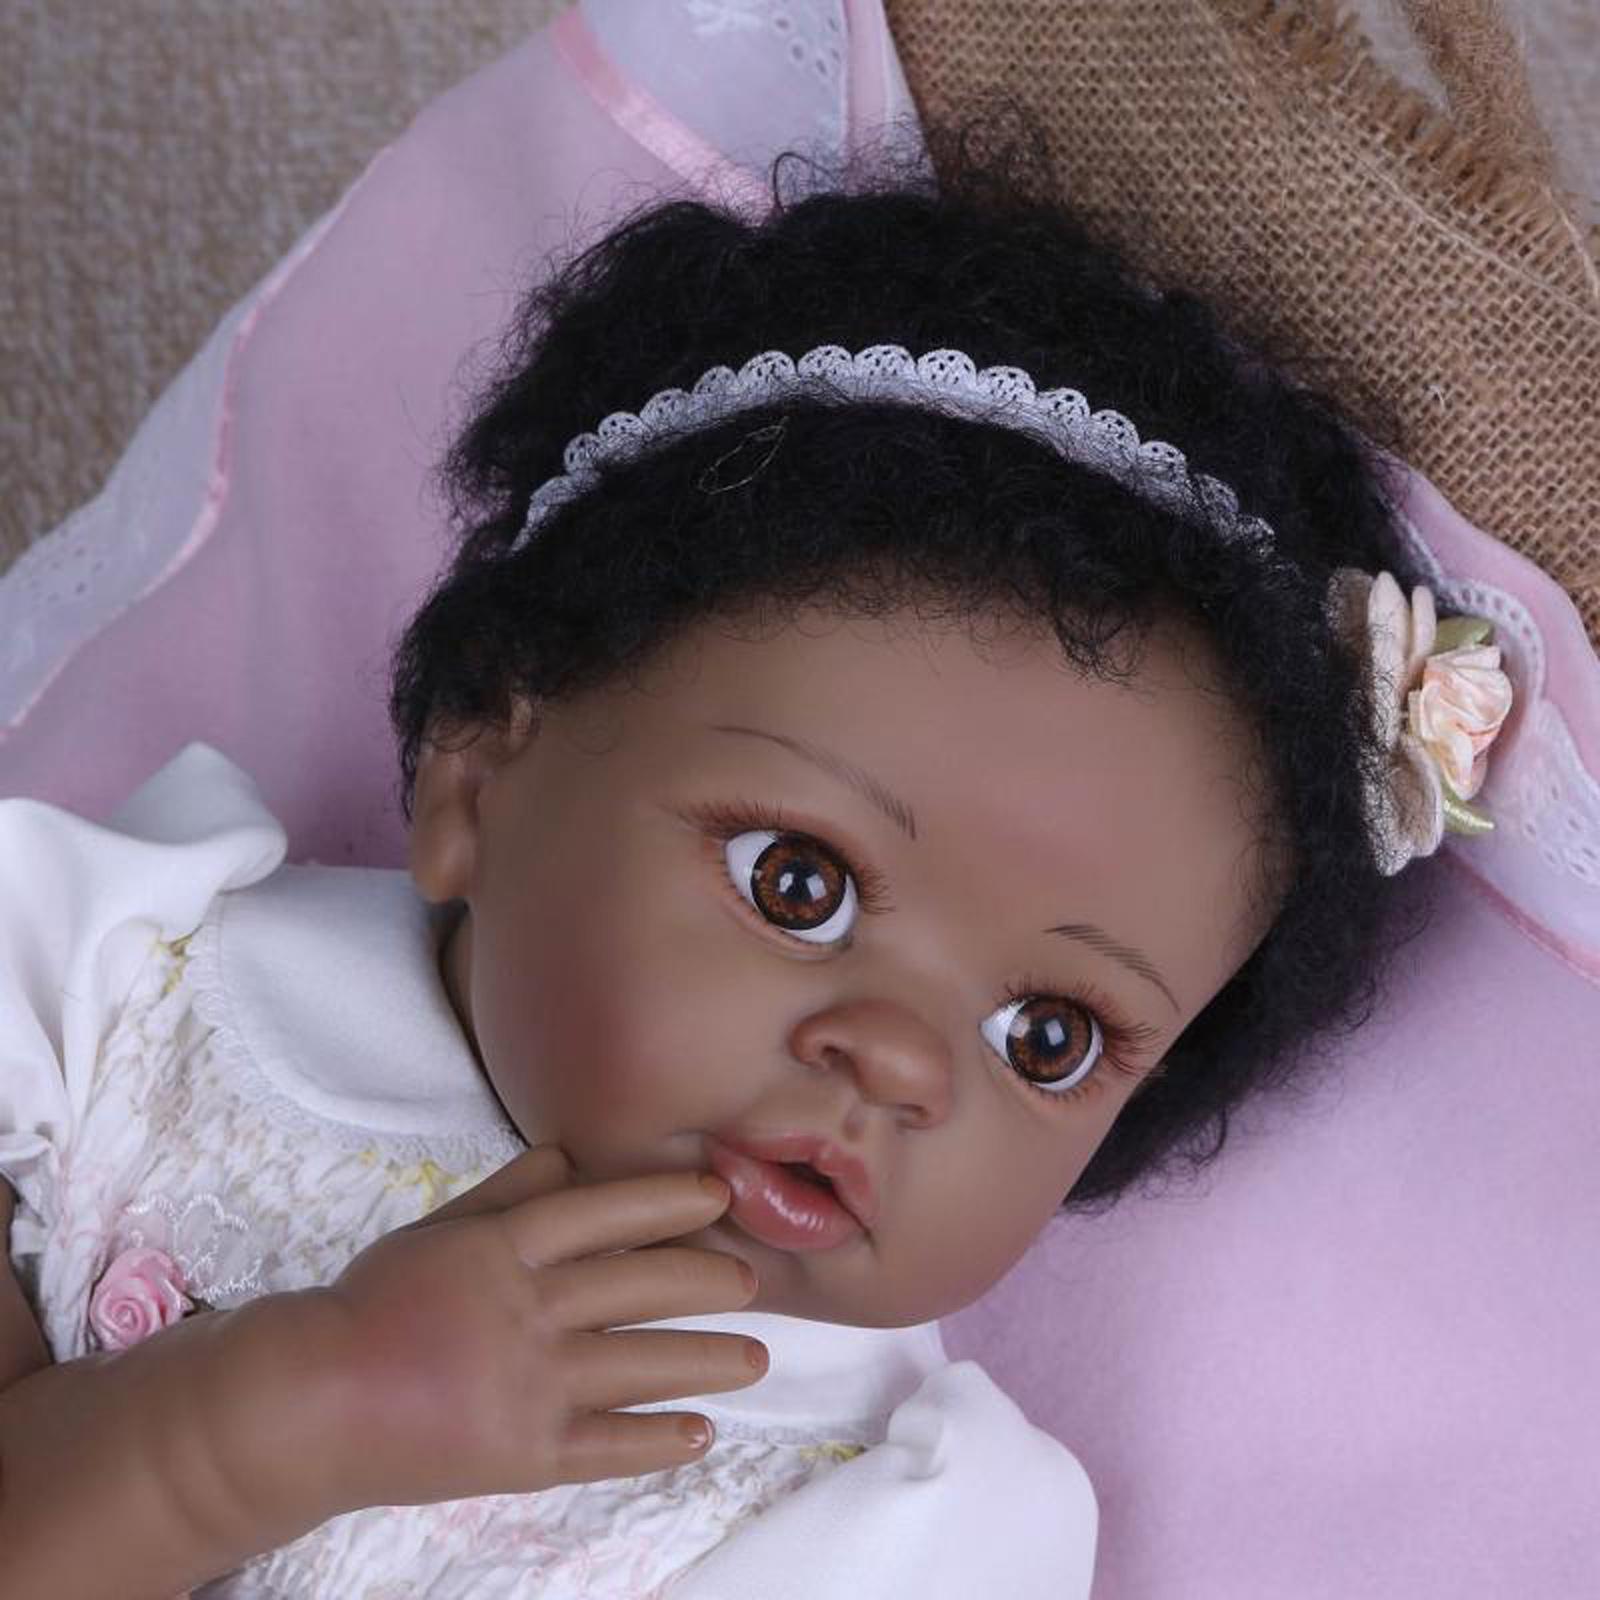 Handmade Lifelike Reborn Doll 22 Newborn Baby Girl